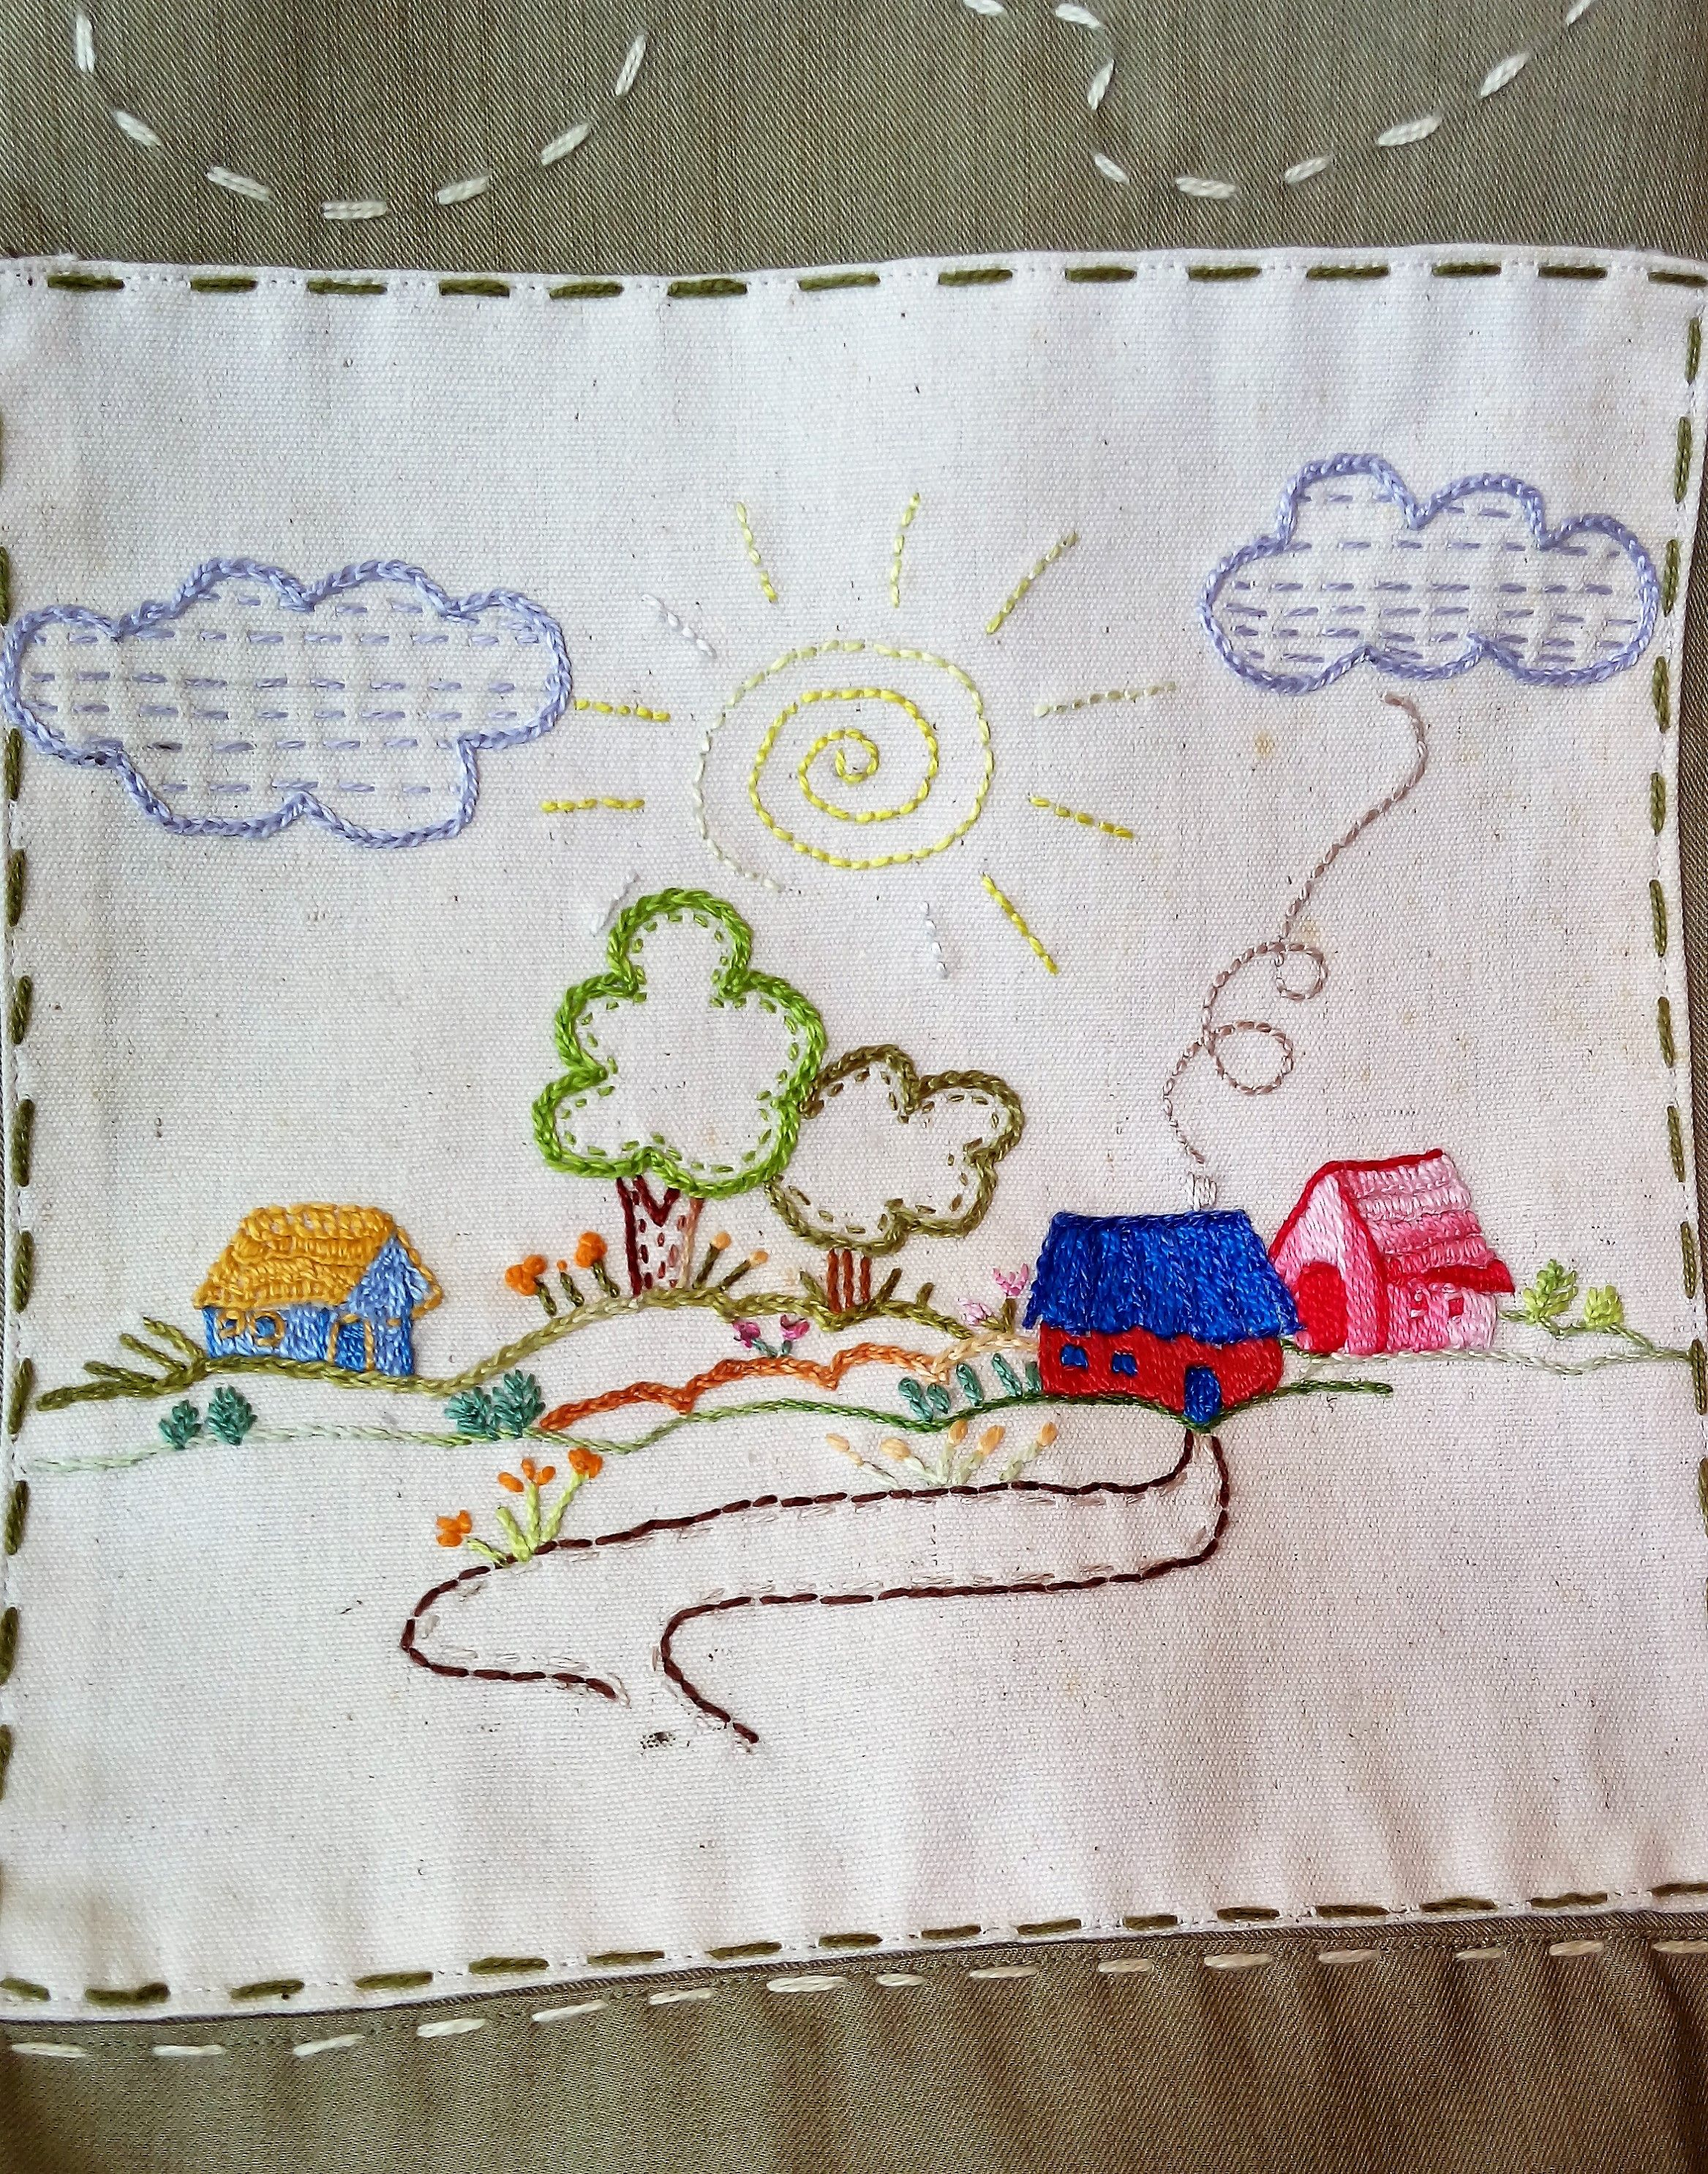 Bordados | Needle felting, stiches, embroidery | Pinterest | Bordado ...